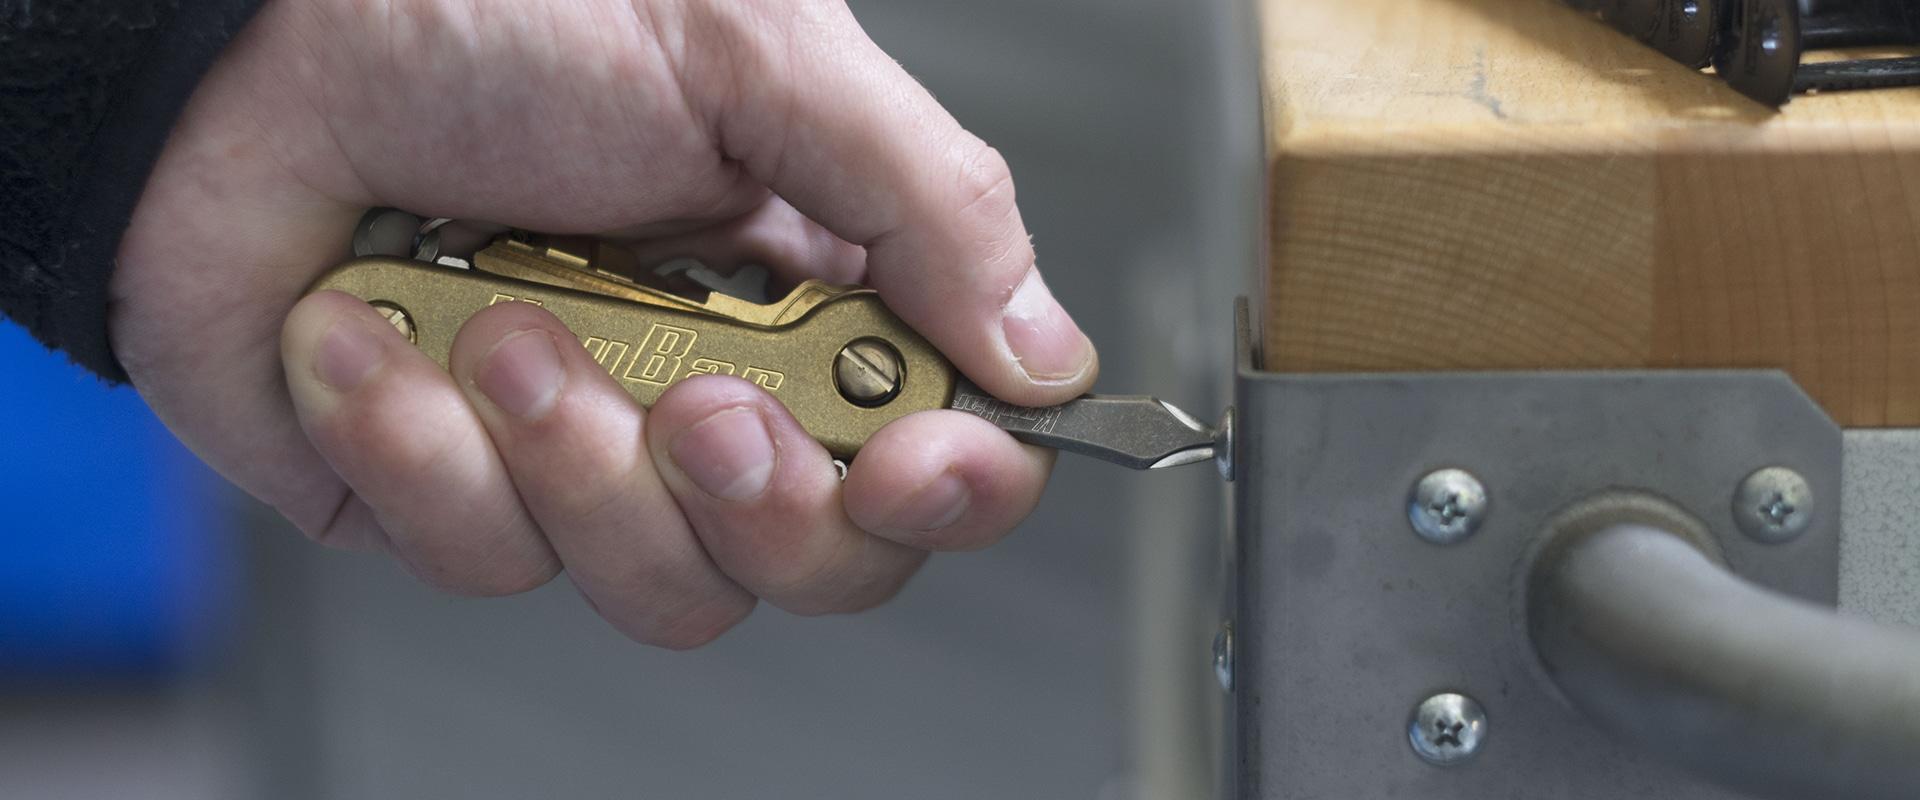 Brass KeyBar with Phillips Head Insert In Use KeyBar Key Organizer EDC Tool v2